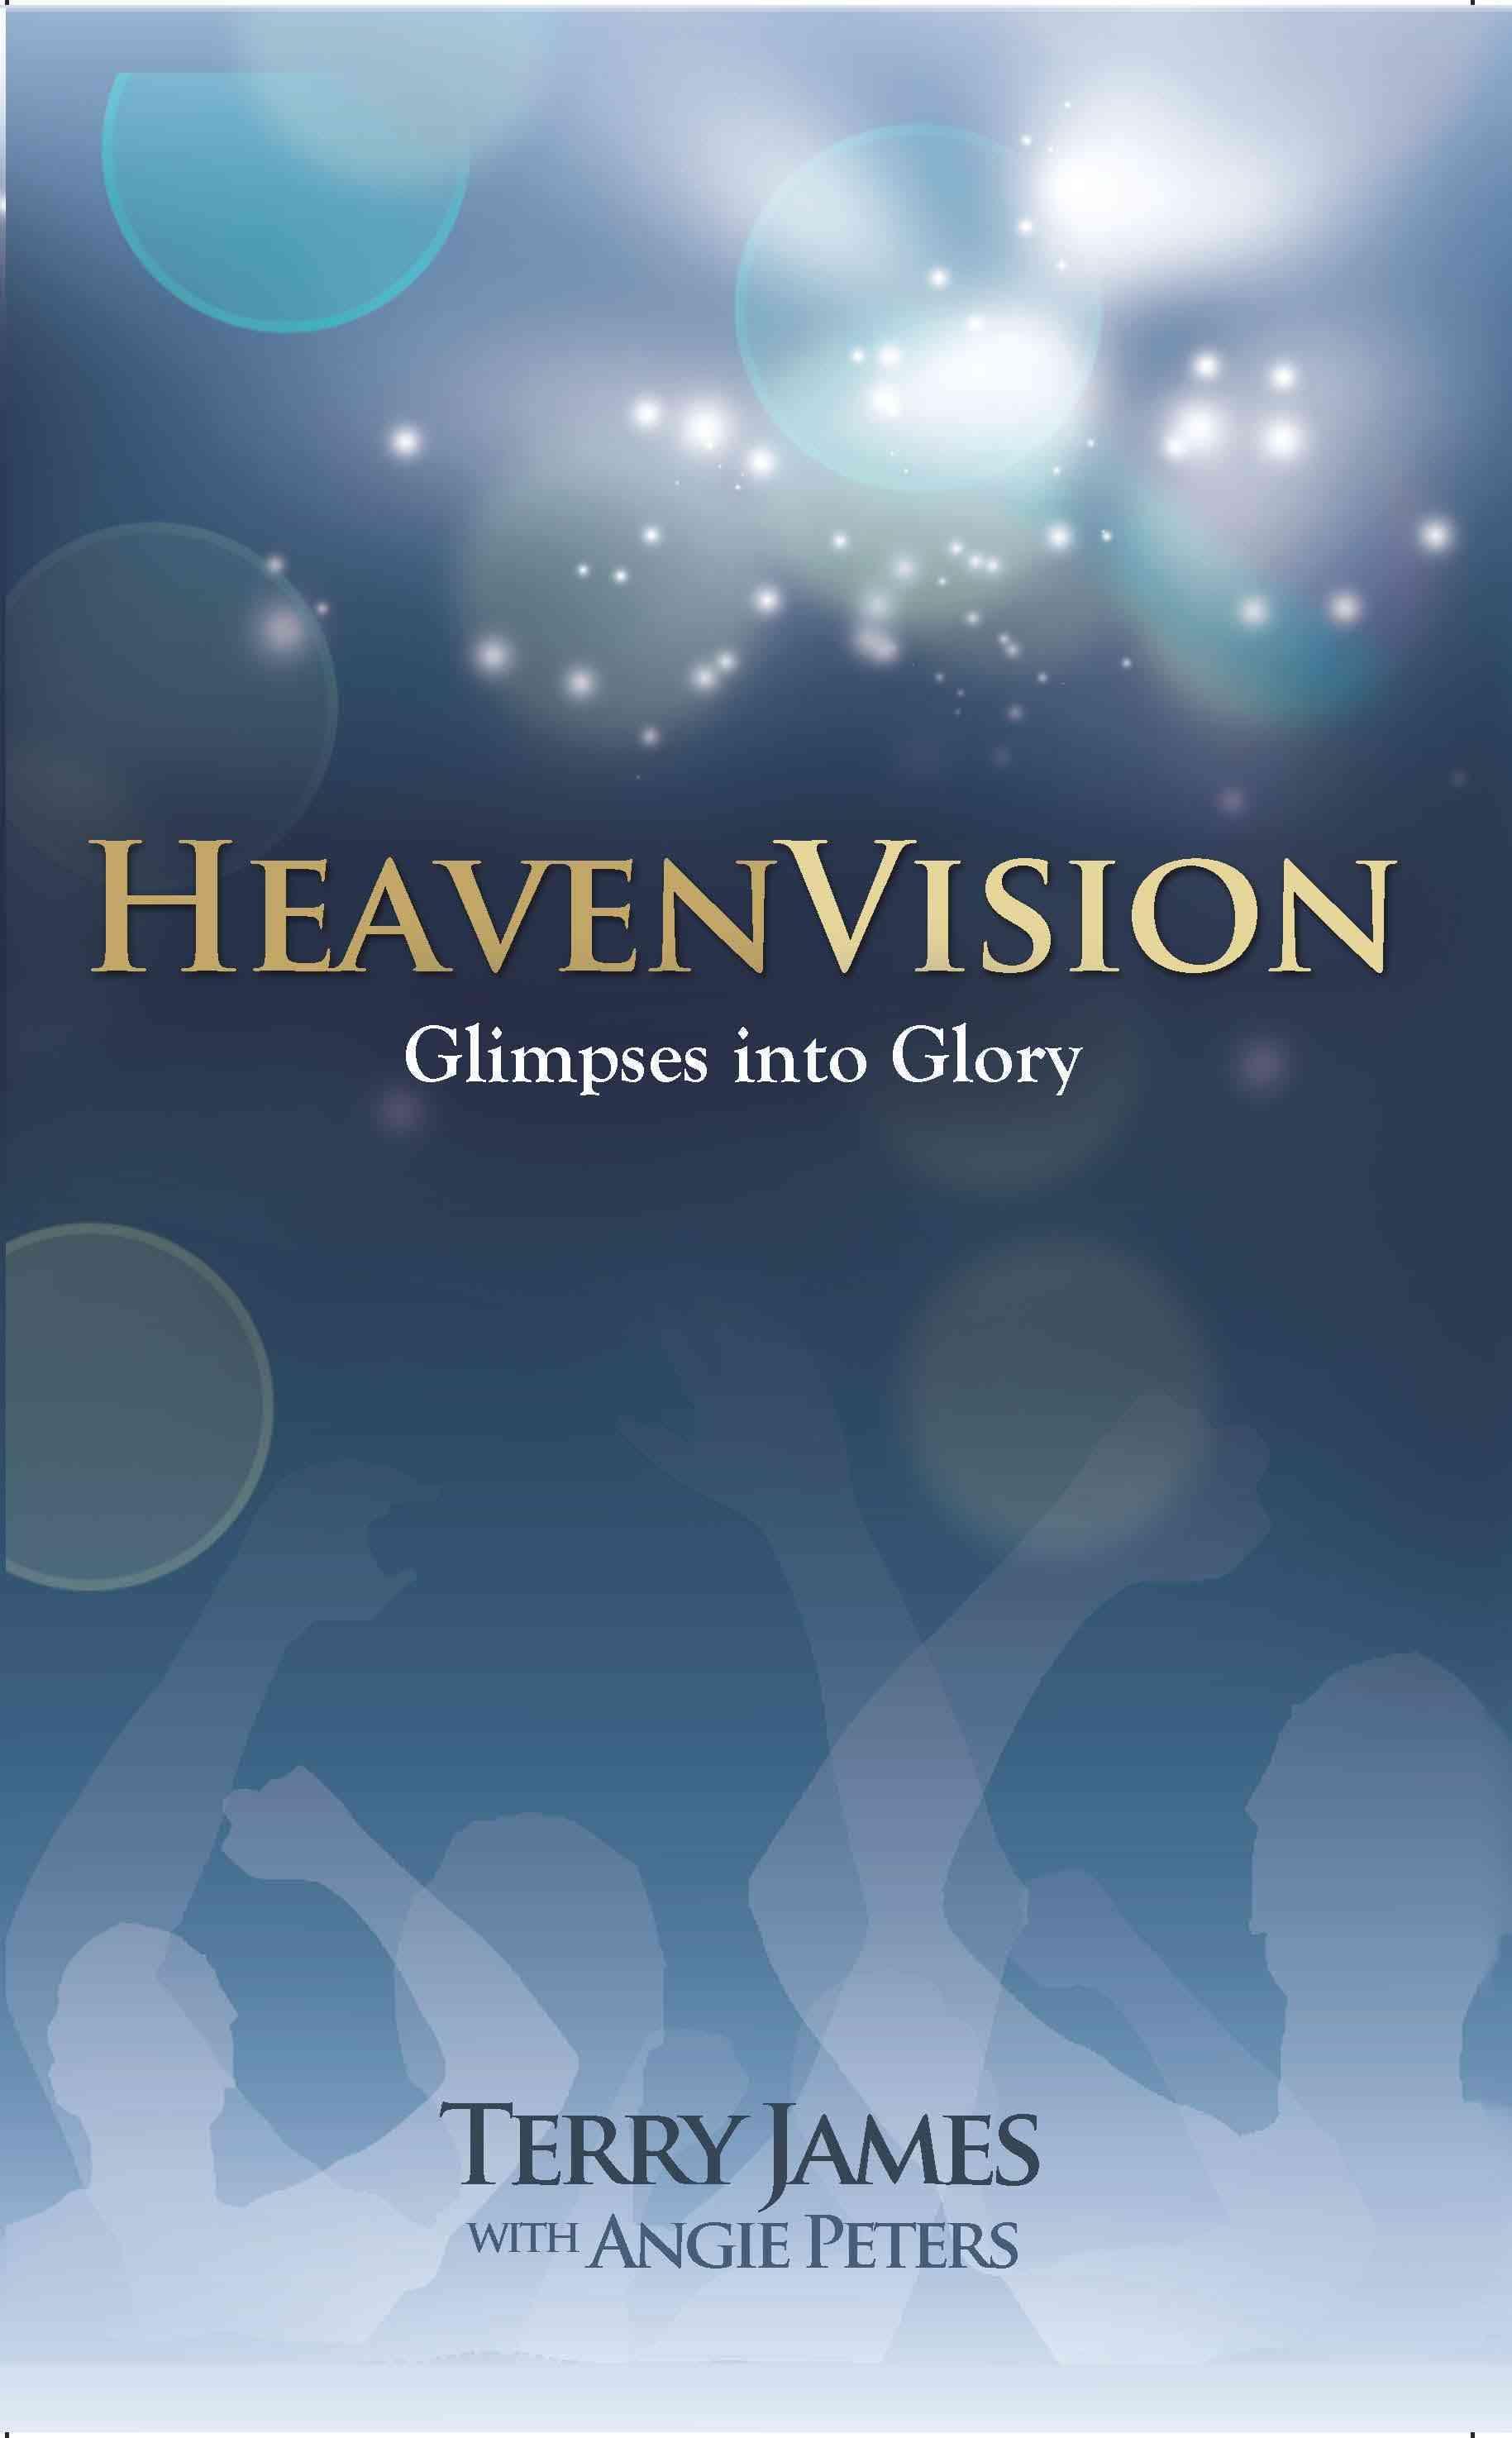 HeavenVision: Glimpses into Glory (Hardcover)